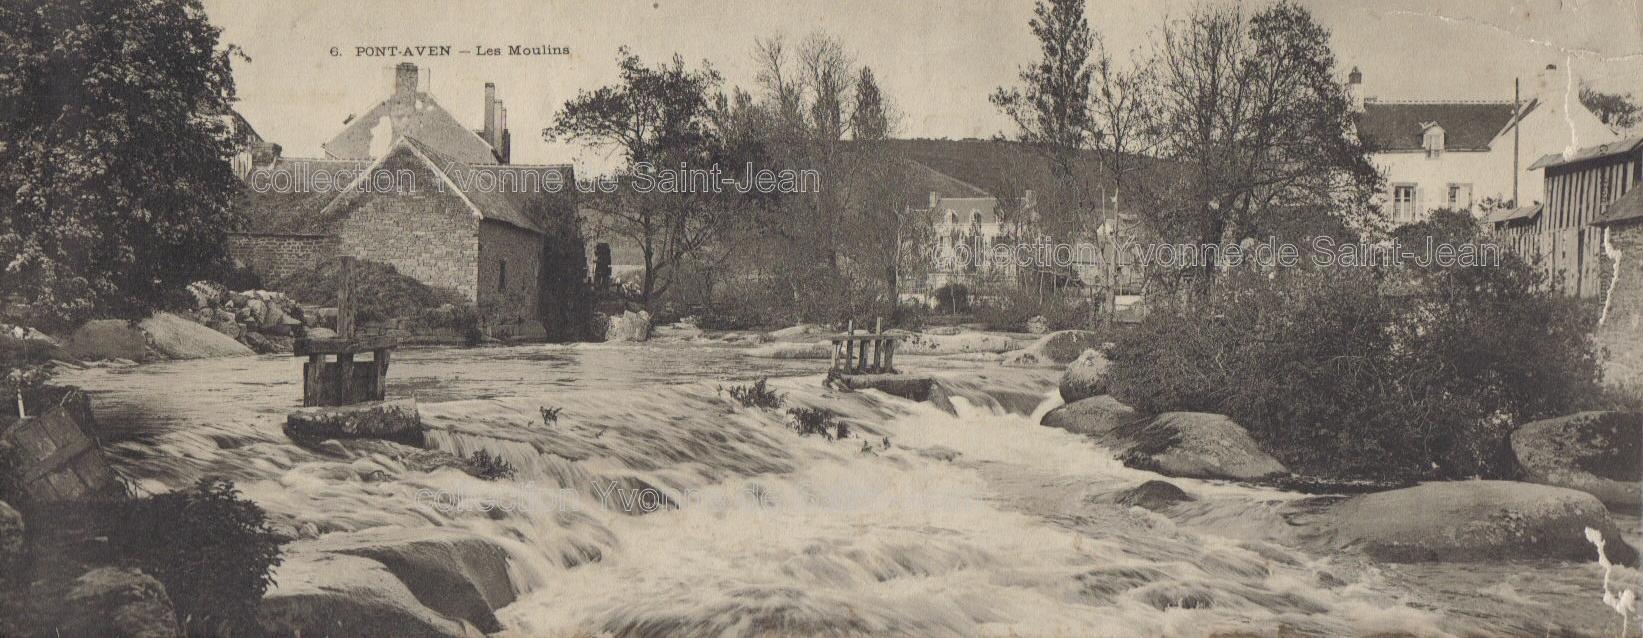 Pont Aven Cartes Postales